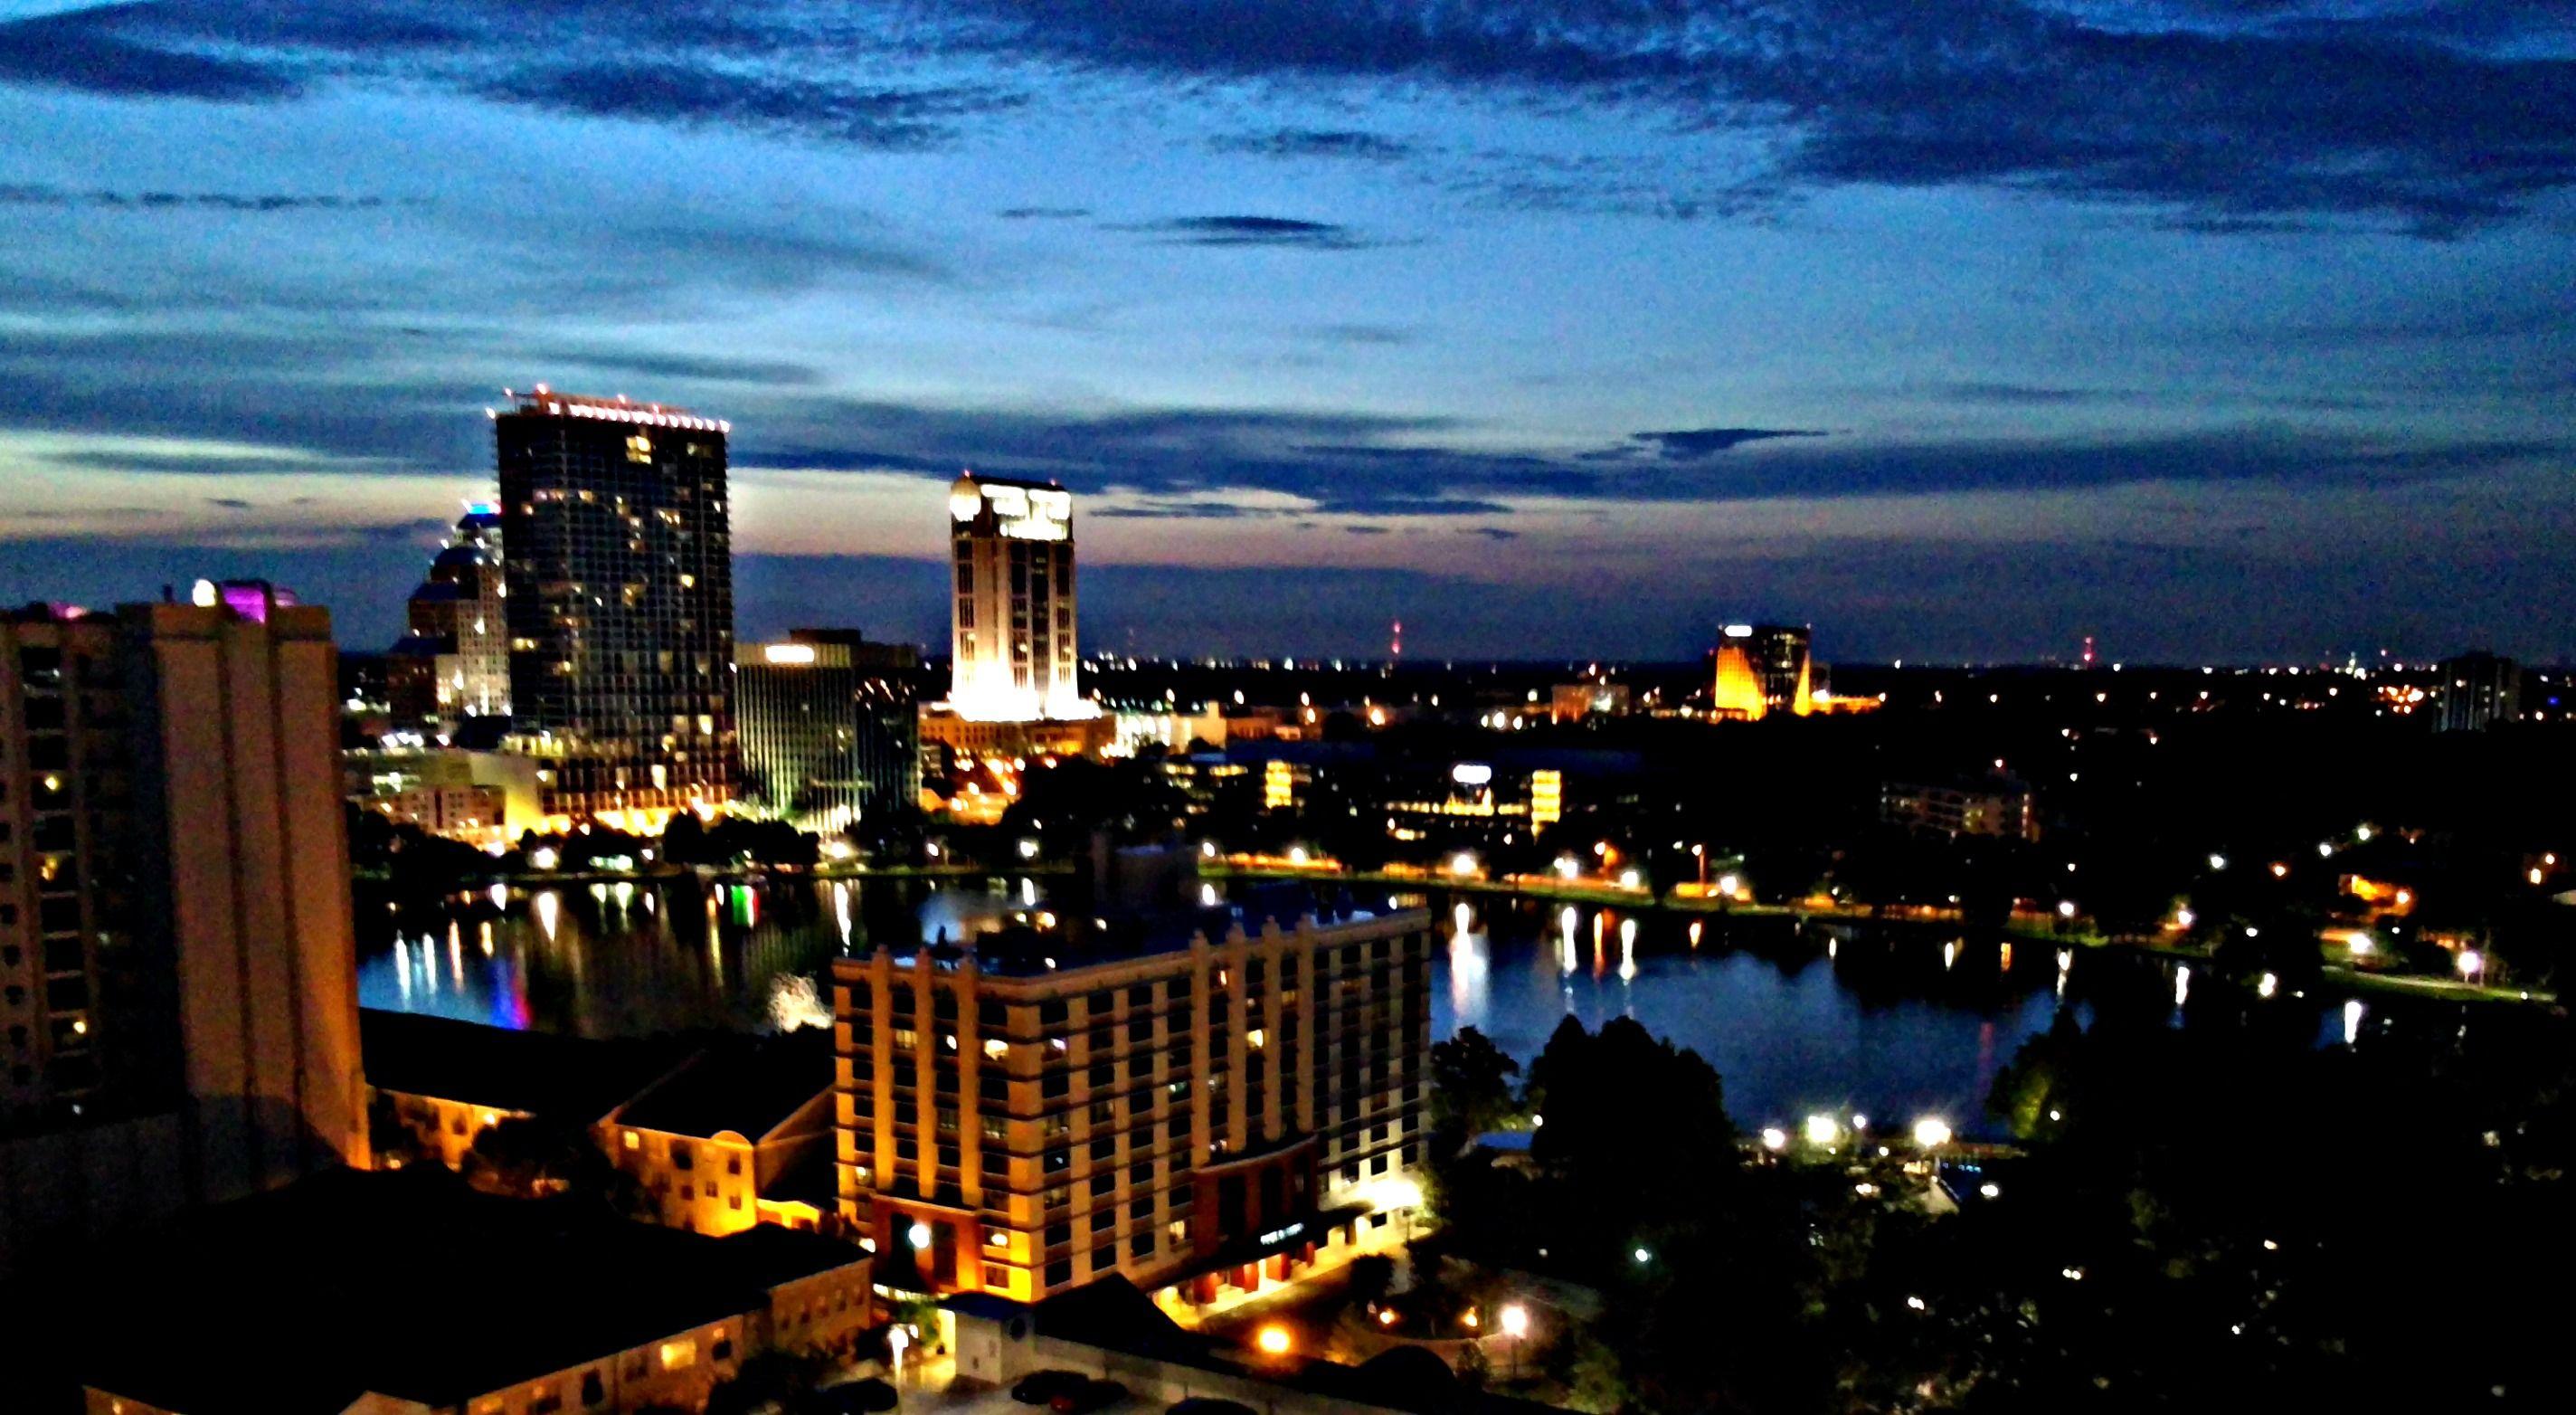 #Orlando at night